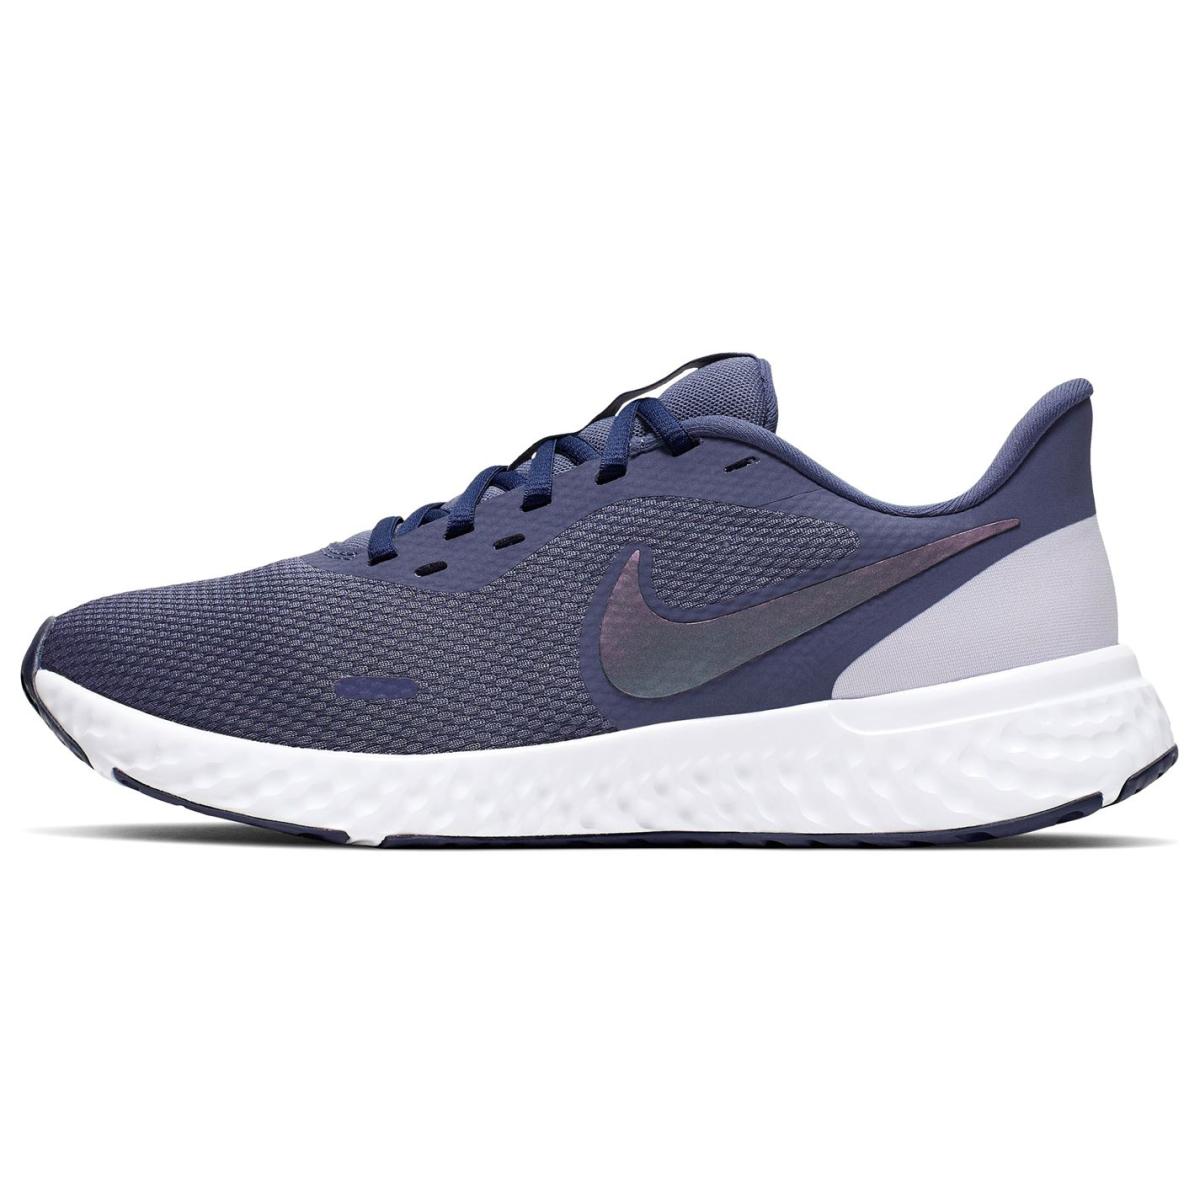 Nike-Revolution-Turnschuhe-Damen-Sneaker-Sportschuhe-Laufschuhe-1160 Indexbild 44